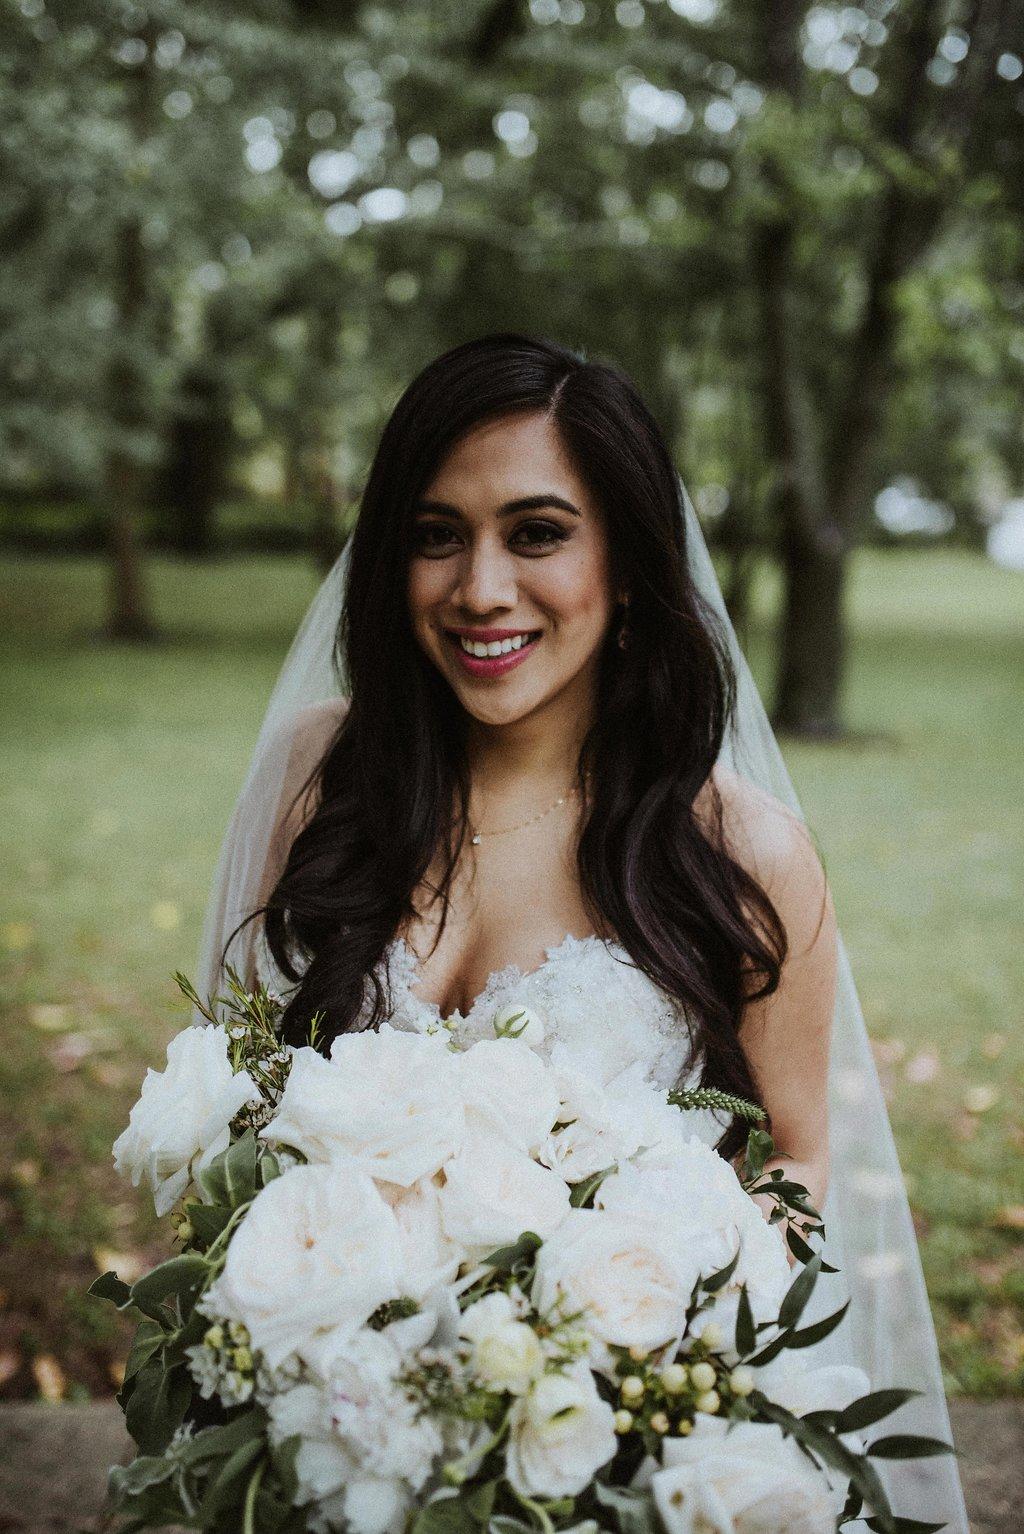 ivory-and-beau-bridal-boutique-alex-and-josephine-meghan-melia-photography-brockington-hall-wedding-savannah-wedding-23.jpg